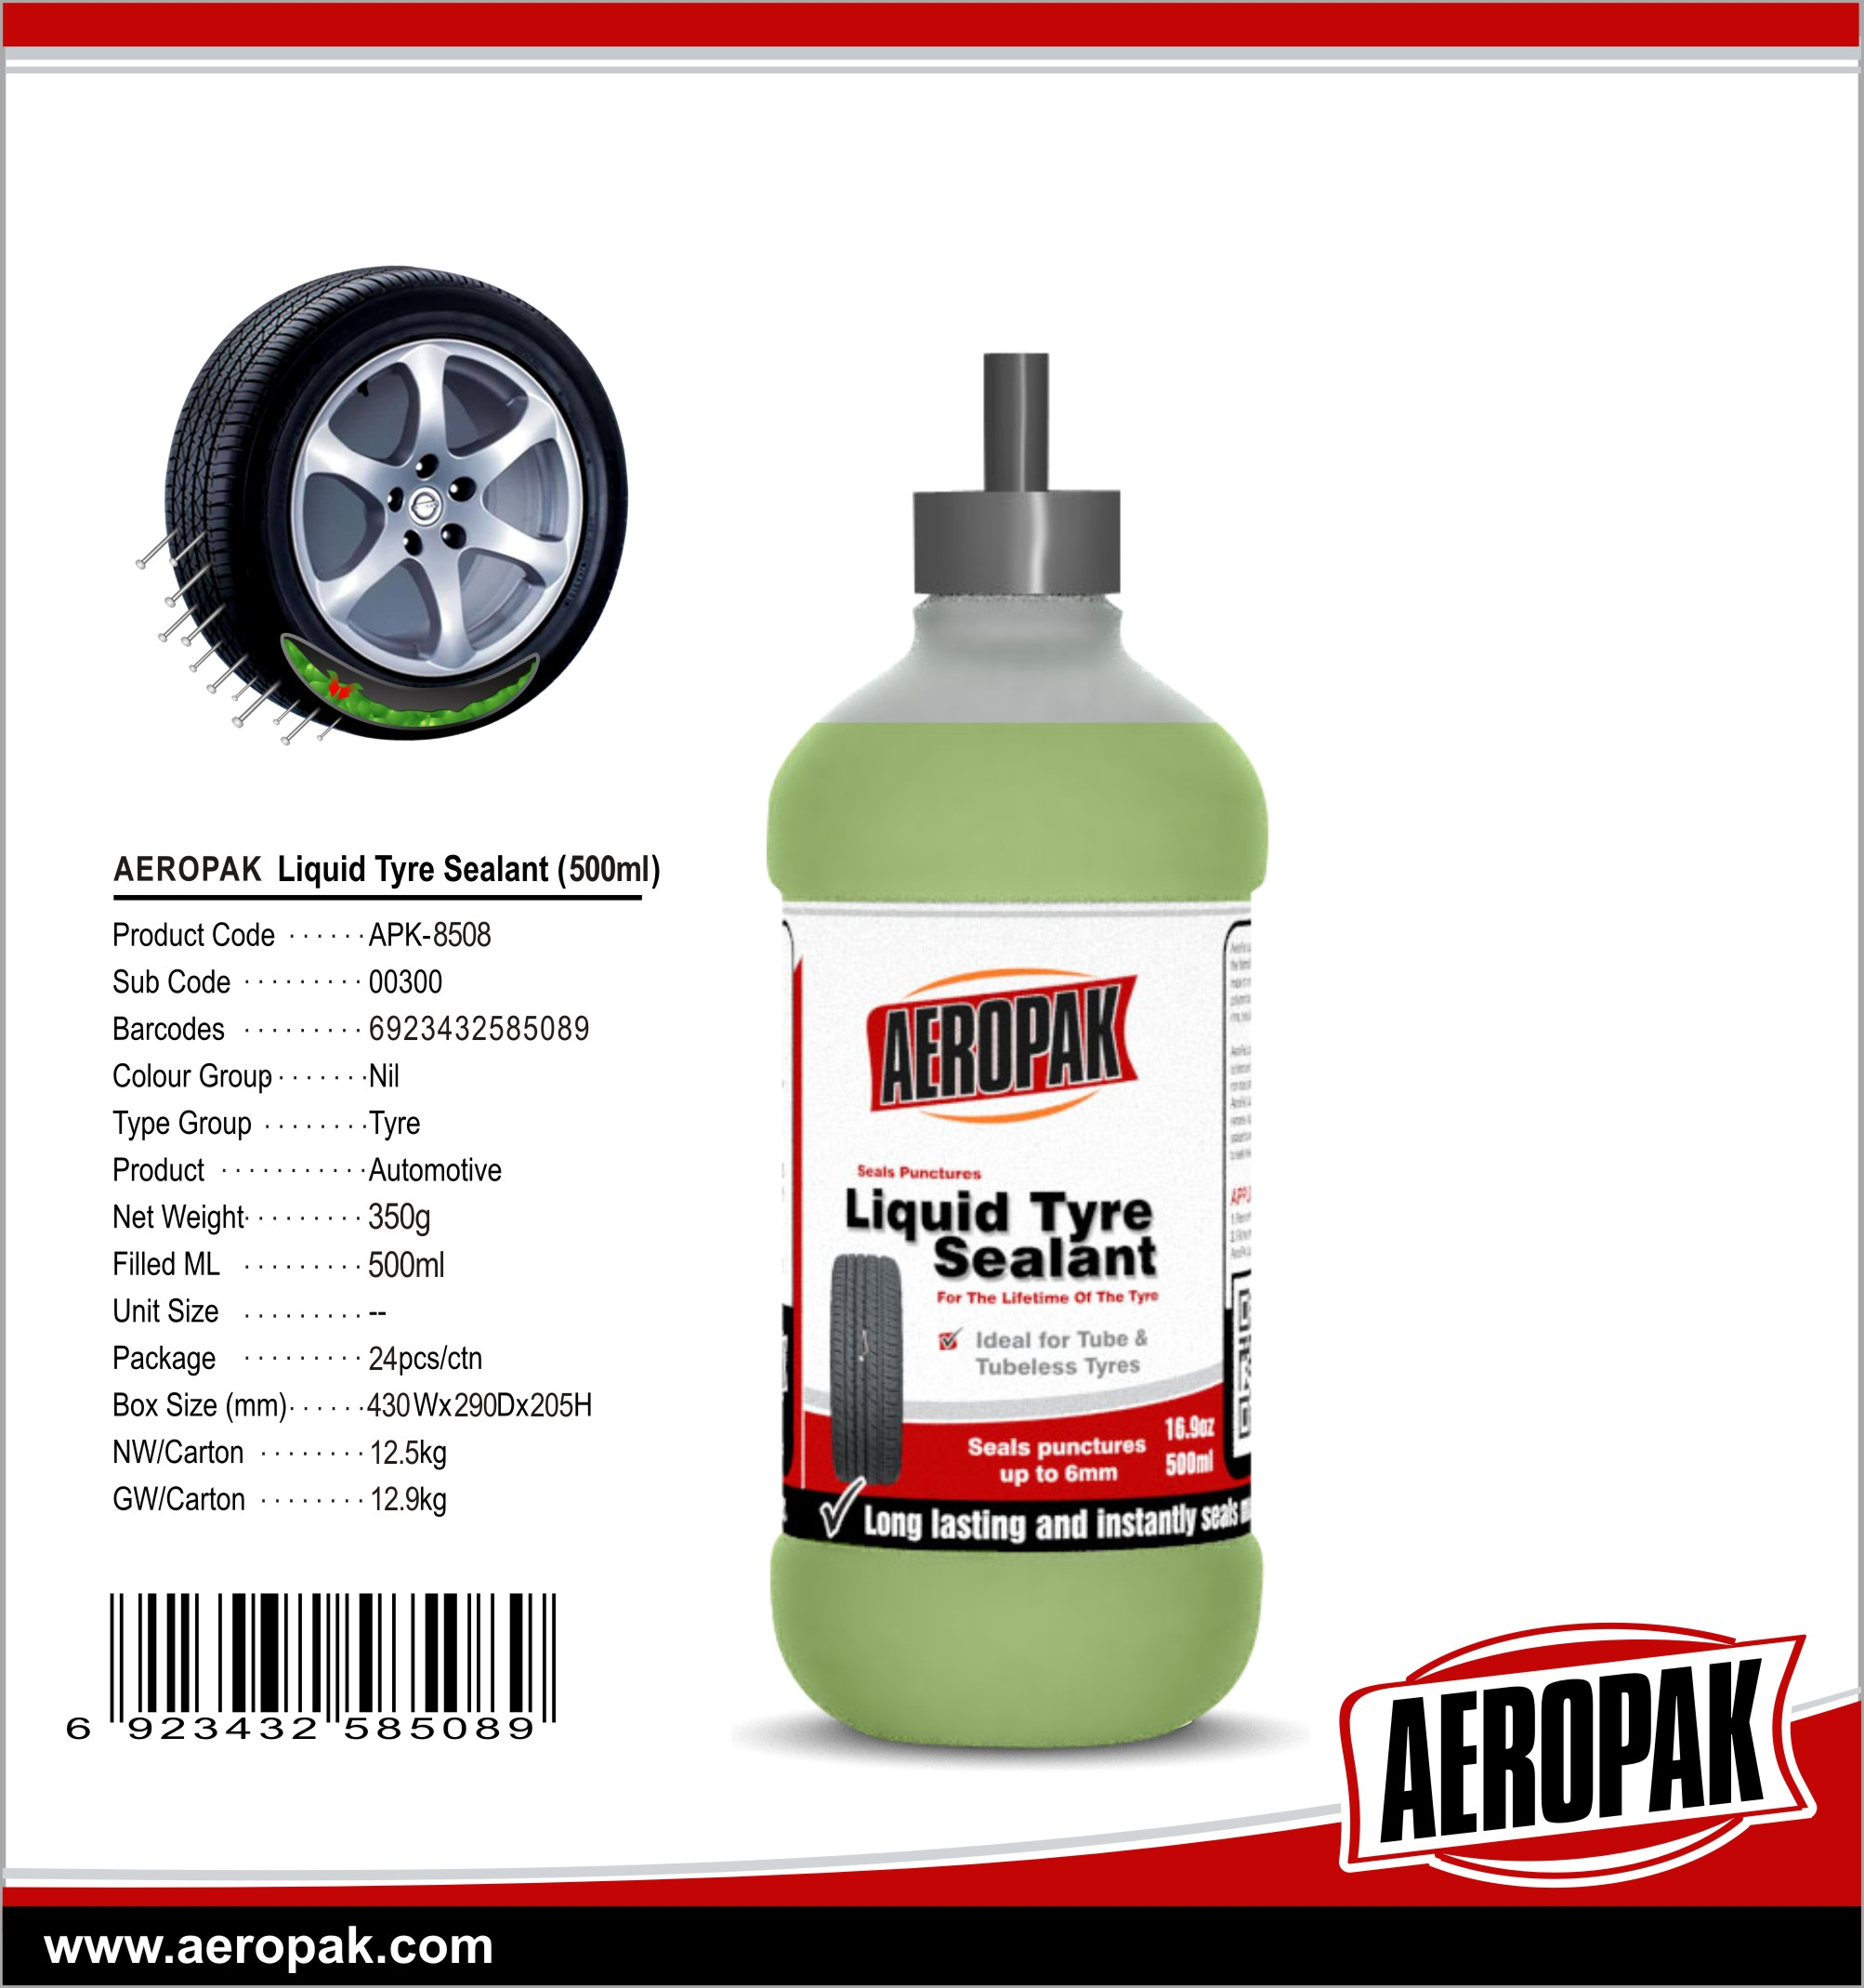 AEROPAK Good Quality Liquid Tyre Sealant for Tubeless